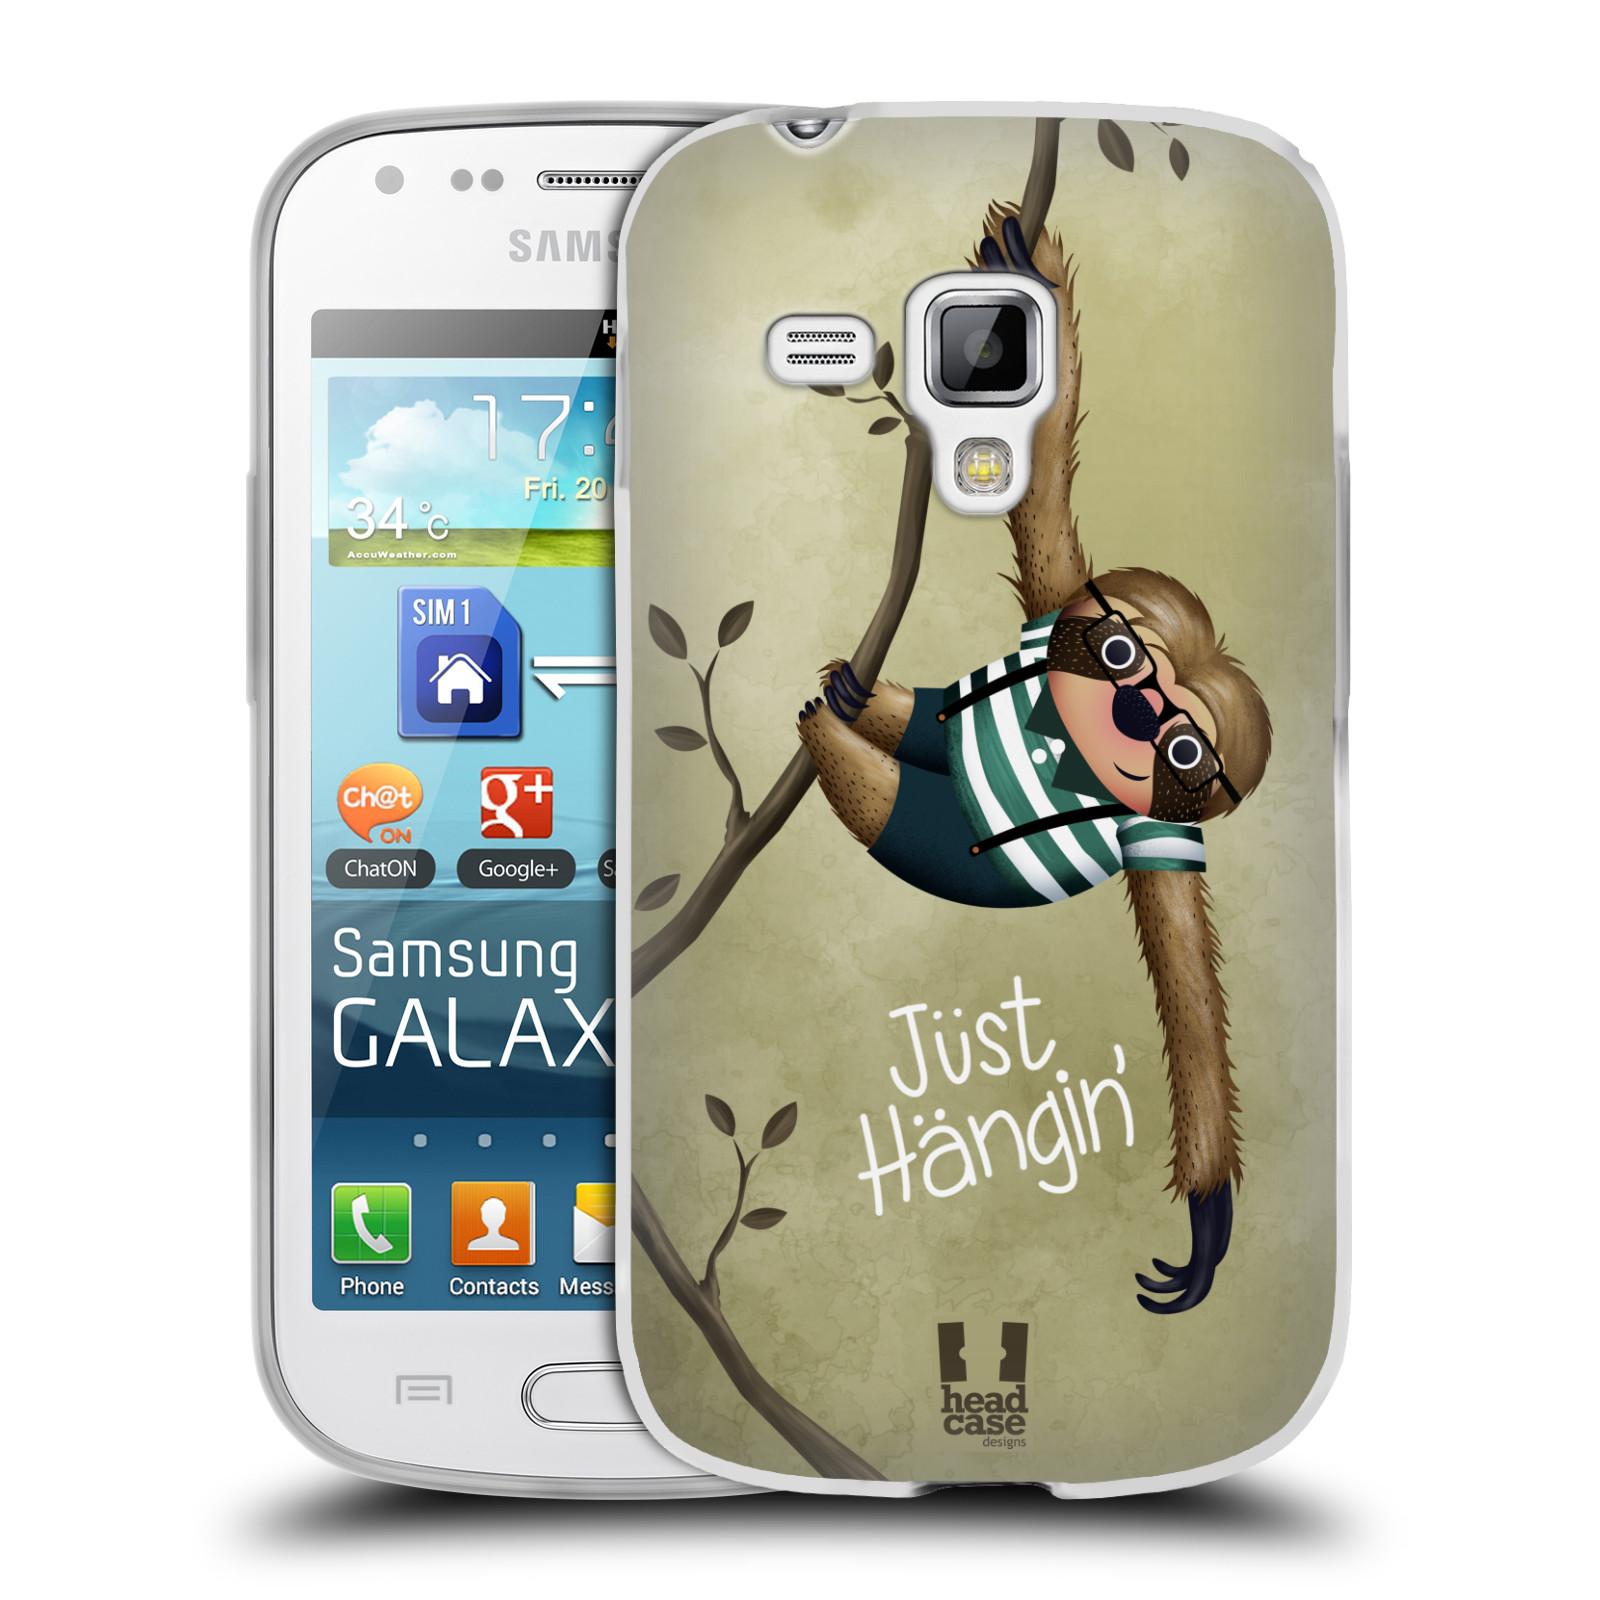 Silikonové pouzdro na mobil Samsung Galaxy S Duos HEAD CASE Lenochod Just Hangin (Silikonový kryt či obal na mobilní telefon Samsung Galaxy S Duos GT-S7562)